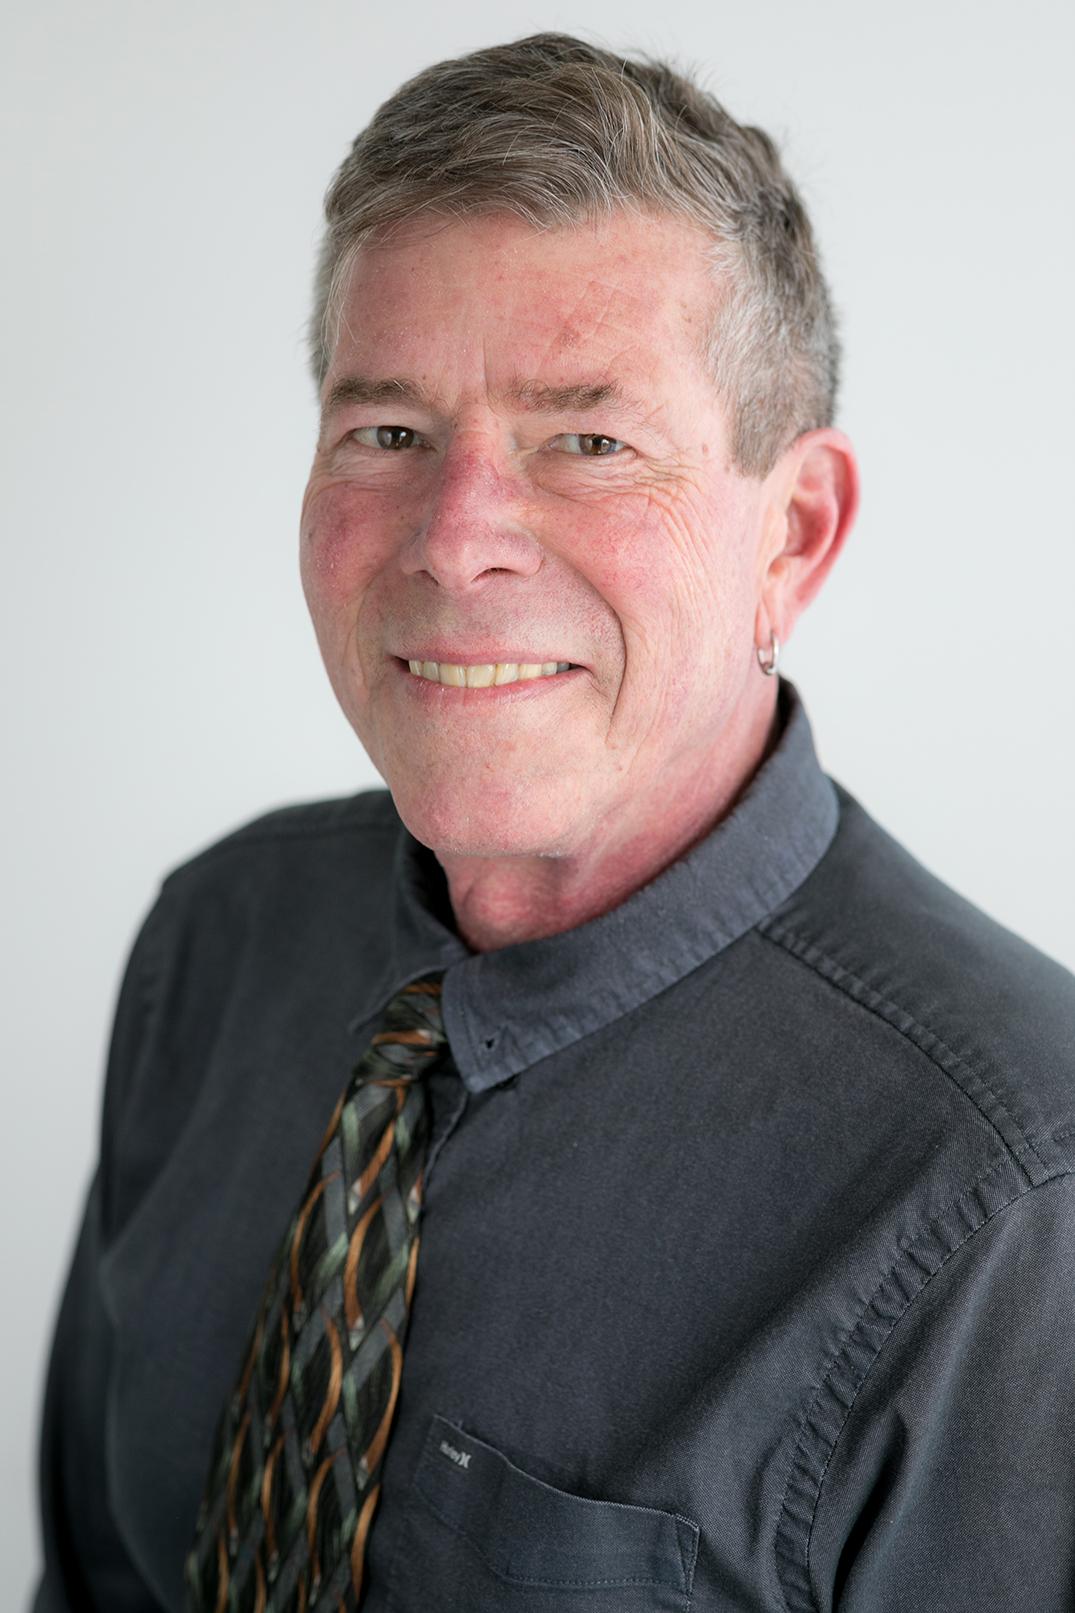 Headshot of Dave Arnold Campbell & Haliburton Regina